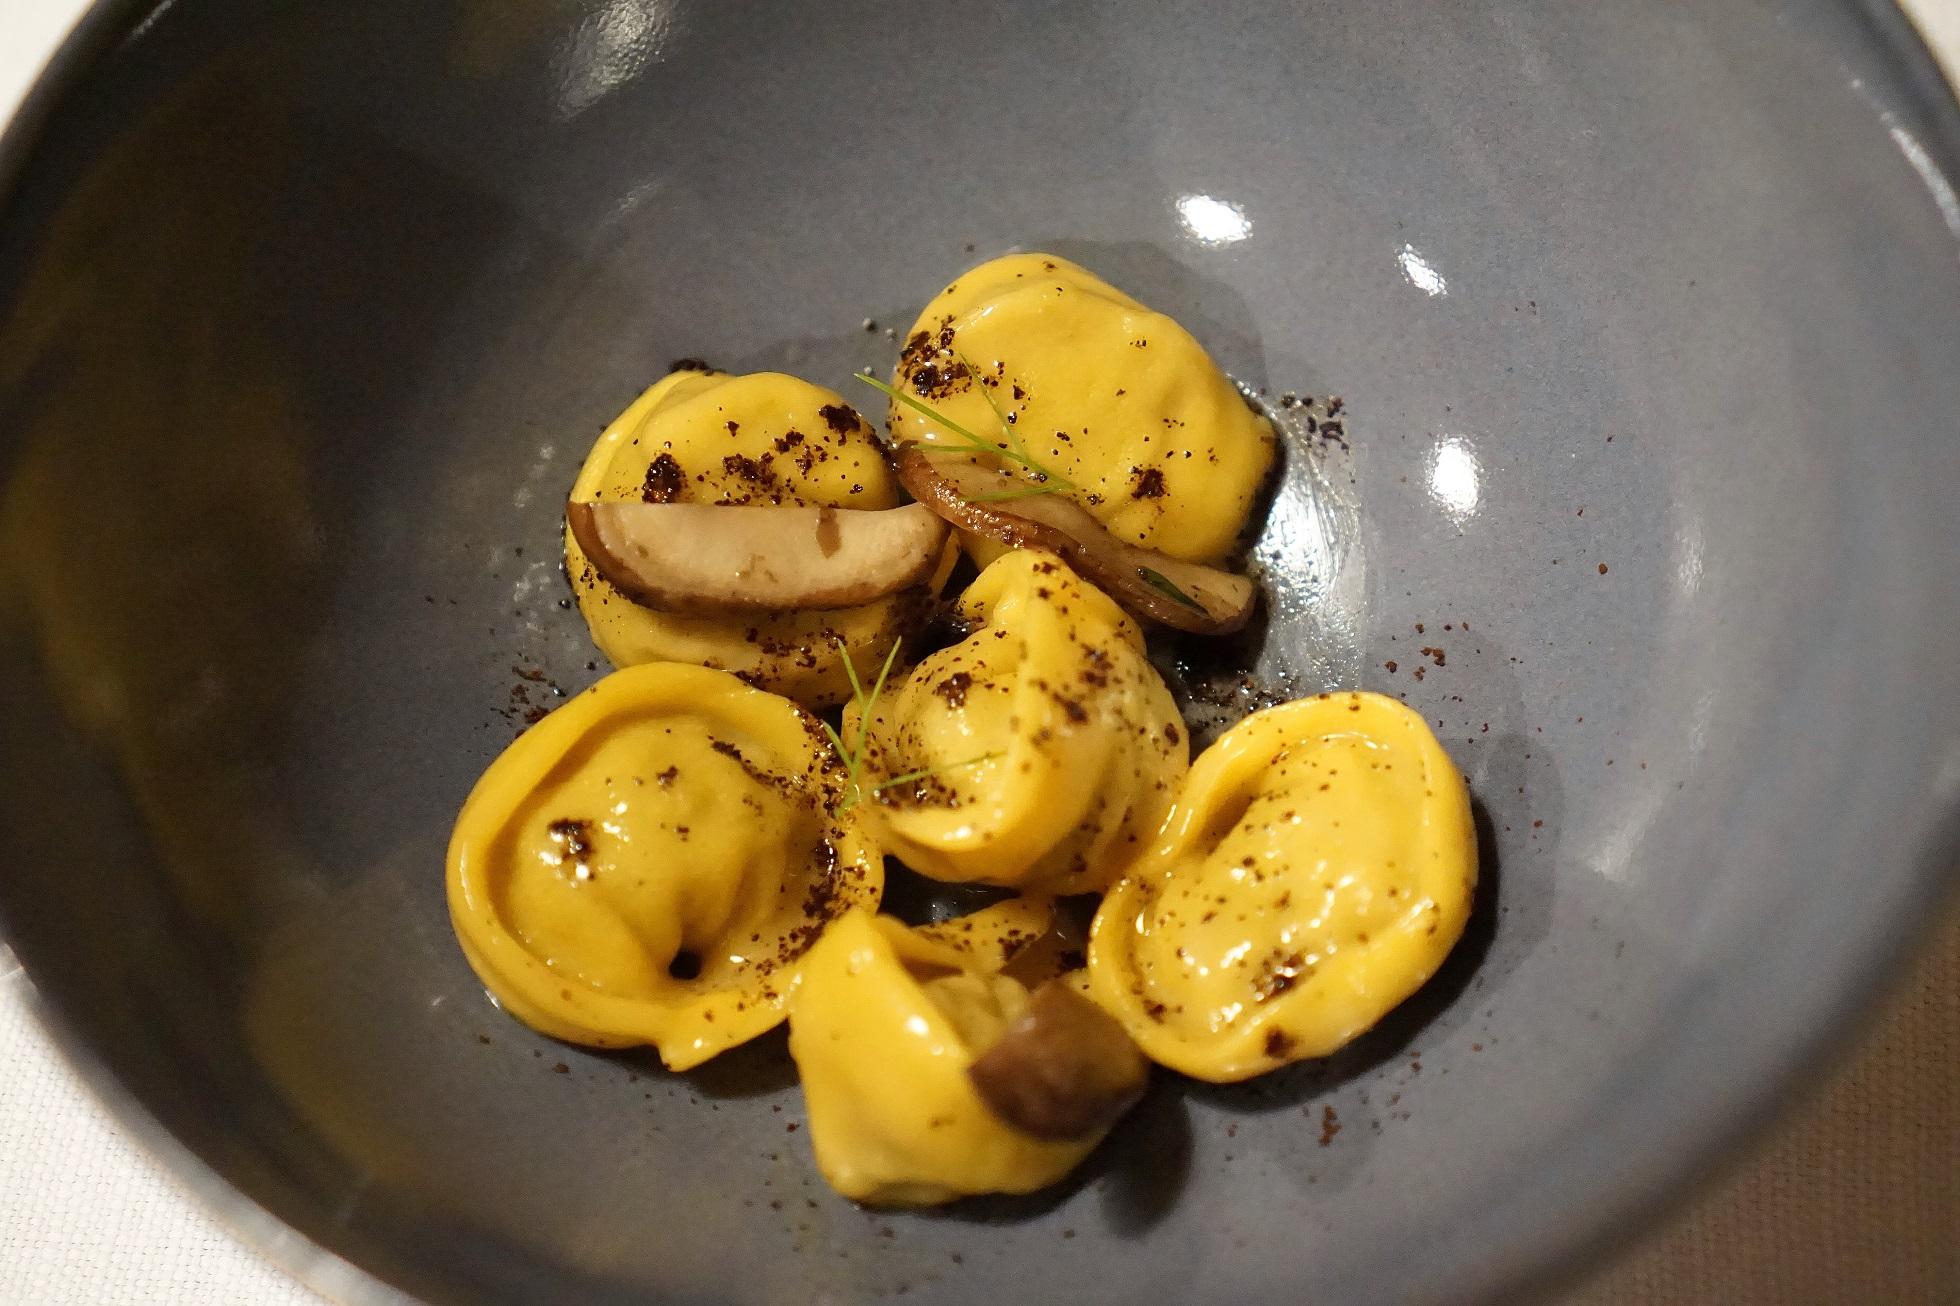 Pincelli, Cavalli, tortelli